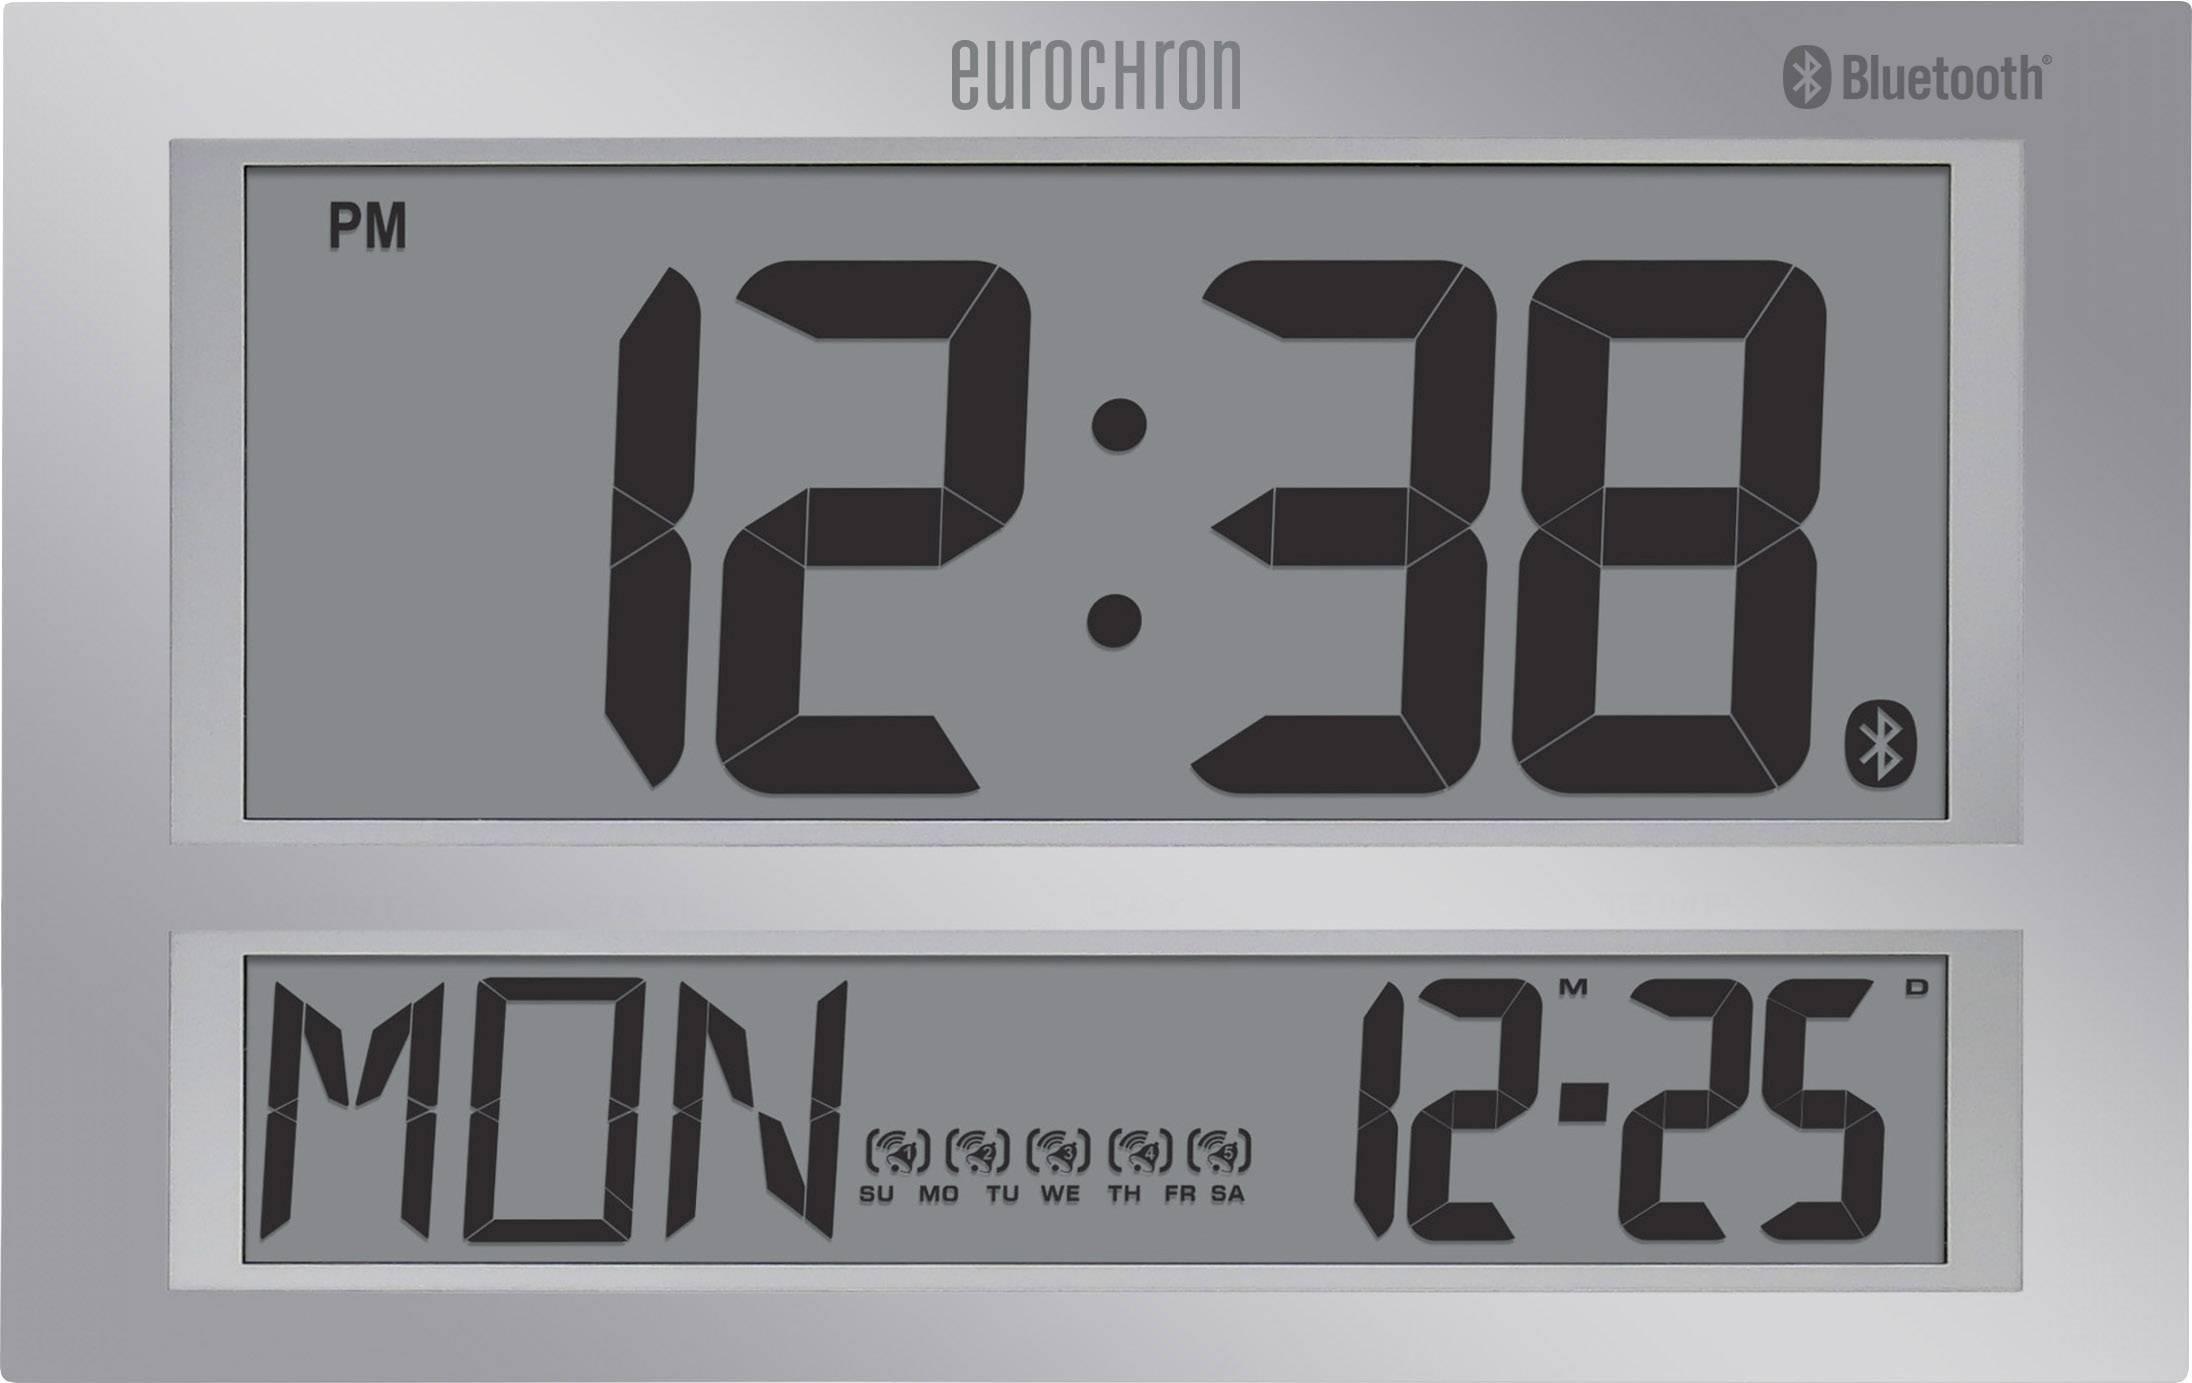 DCF nástenné hodiny Eurochron Jumbo Bluetooth sivá